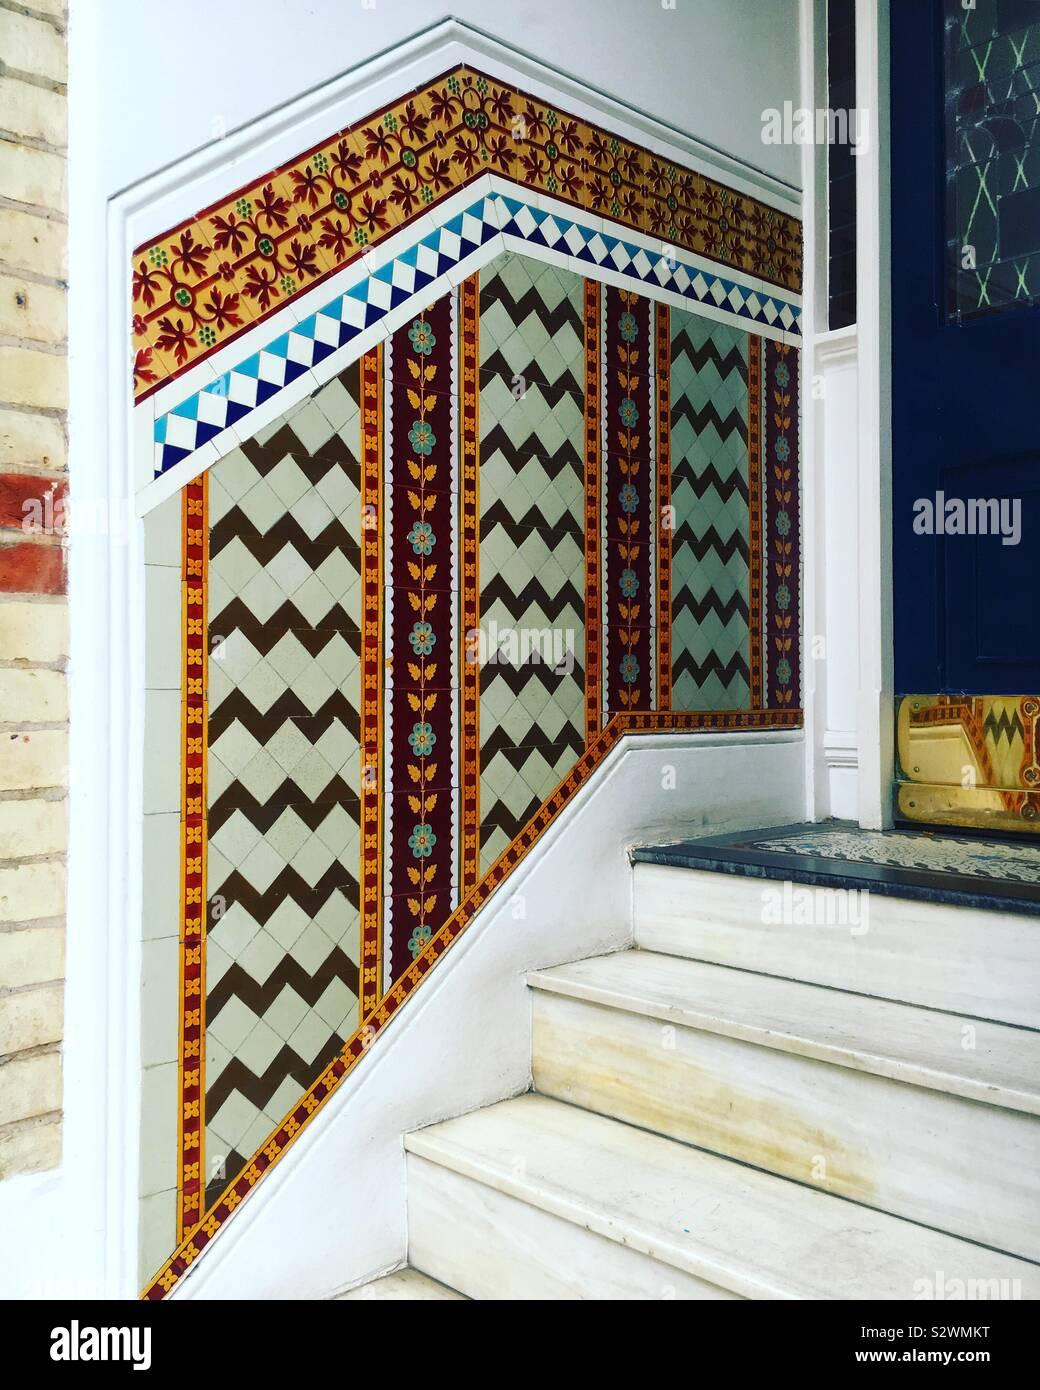 Tiles of London Stock Photo